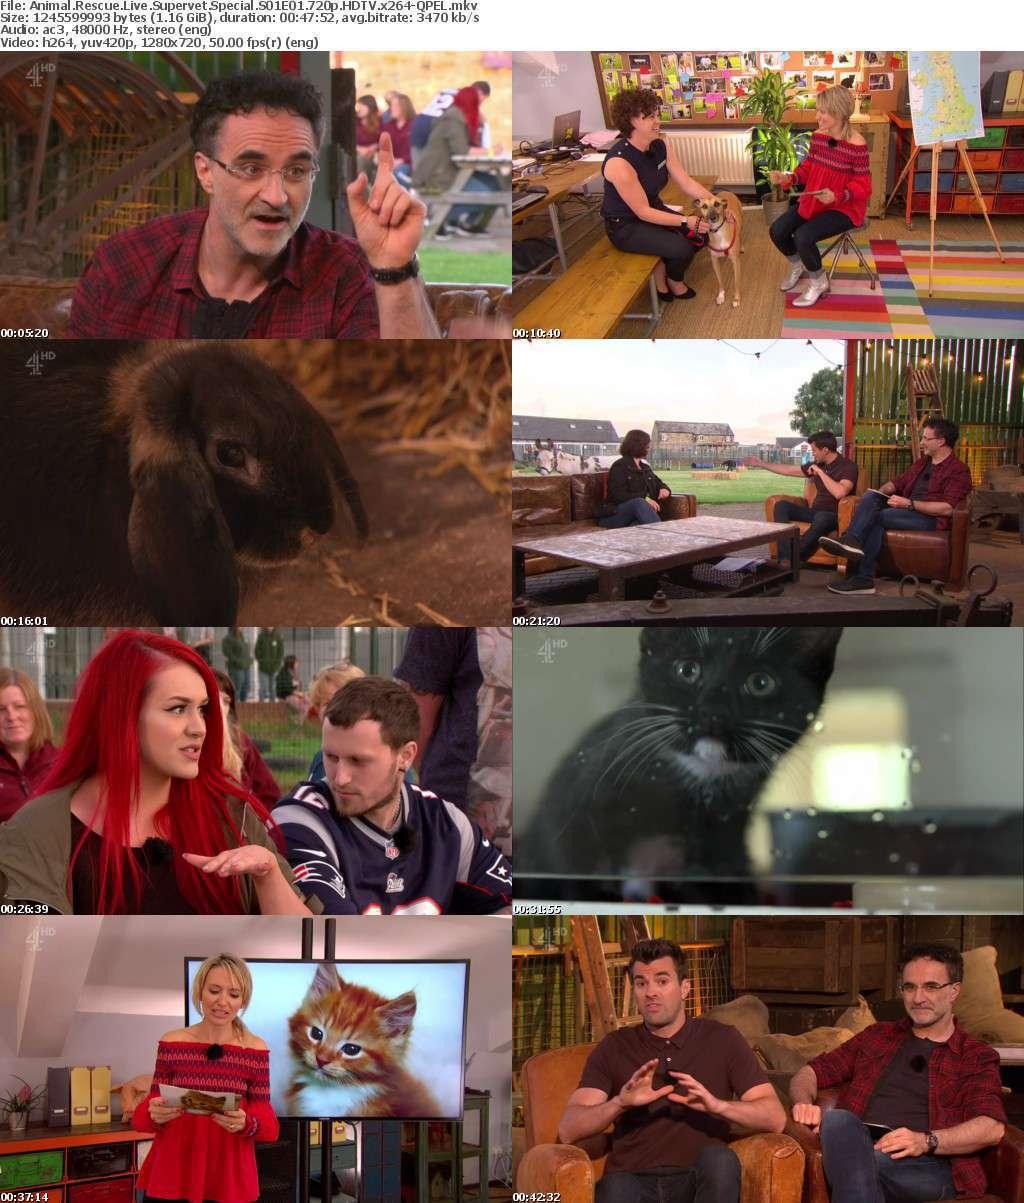 Animal Rescue Live Supervet Special S01E01 720p HDTV x264-QPEL